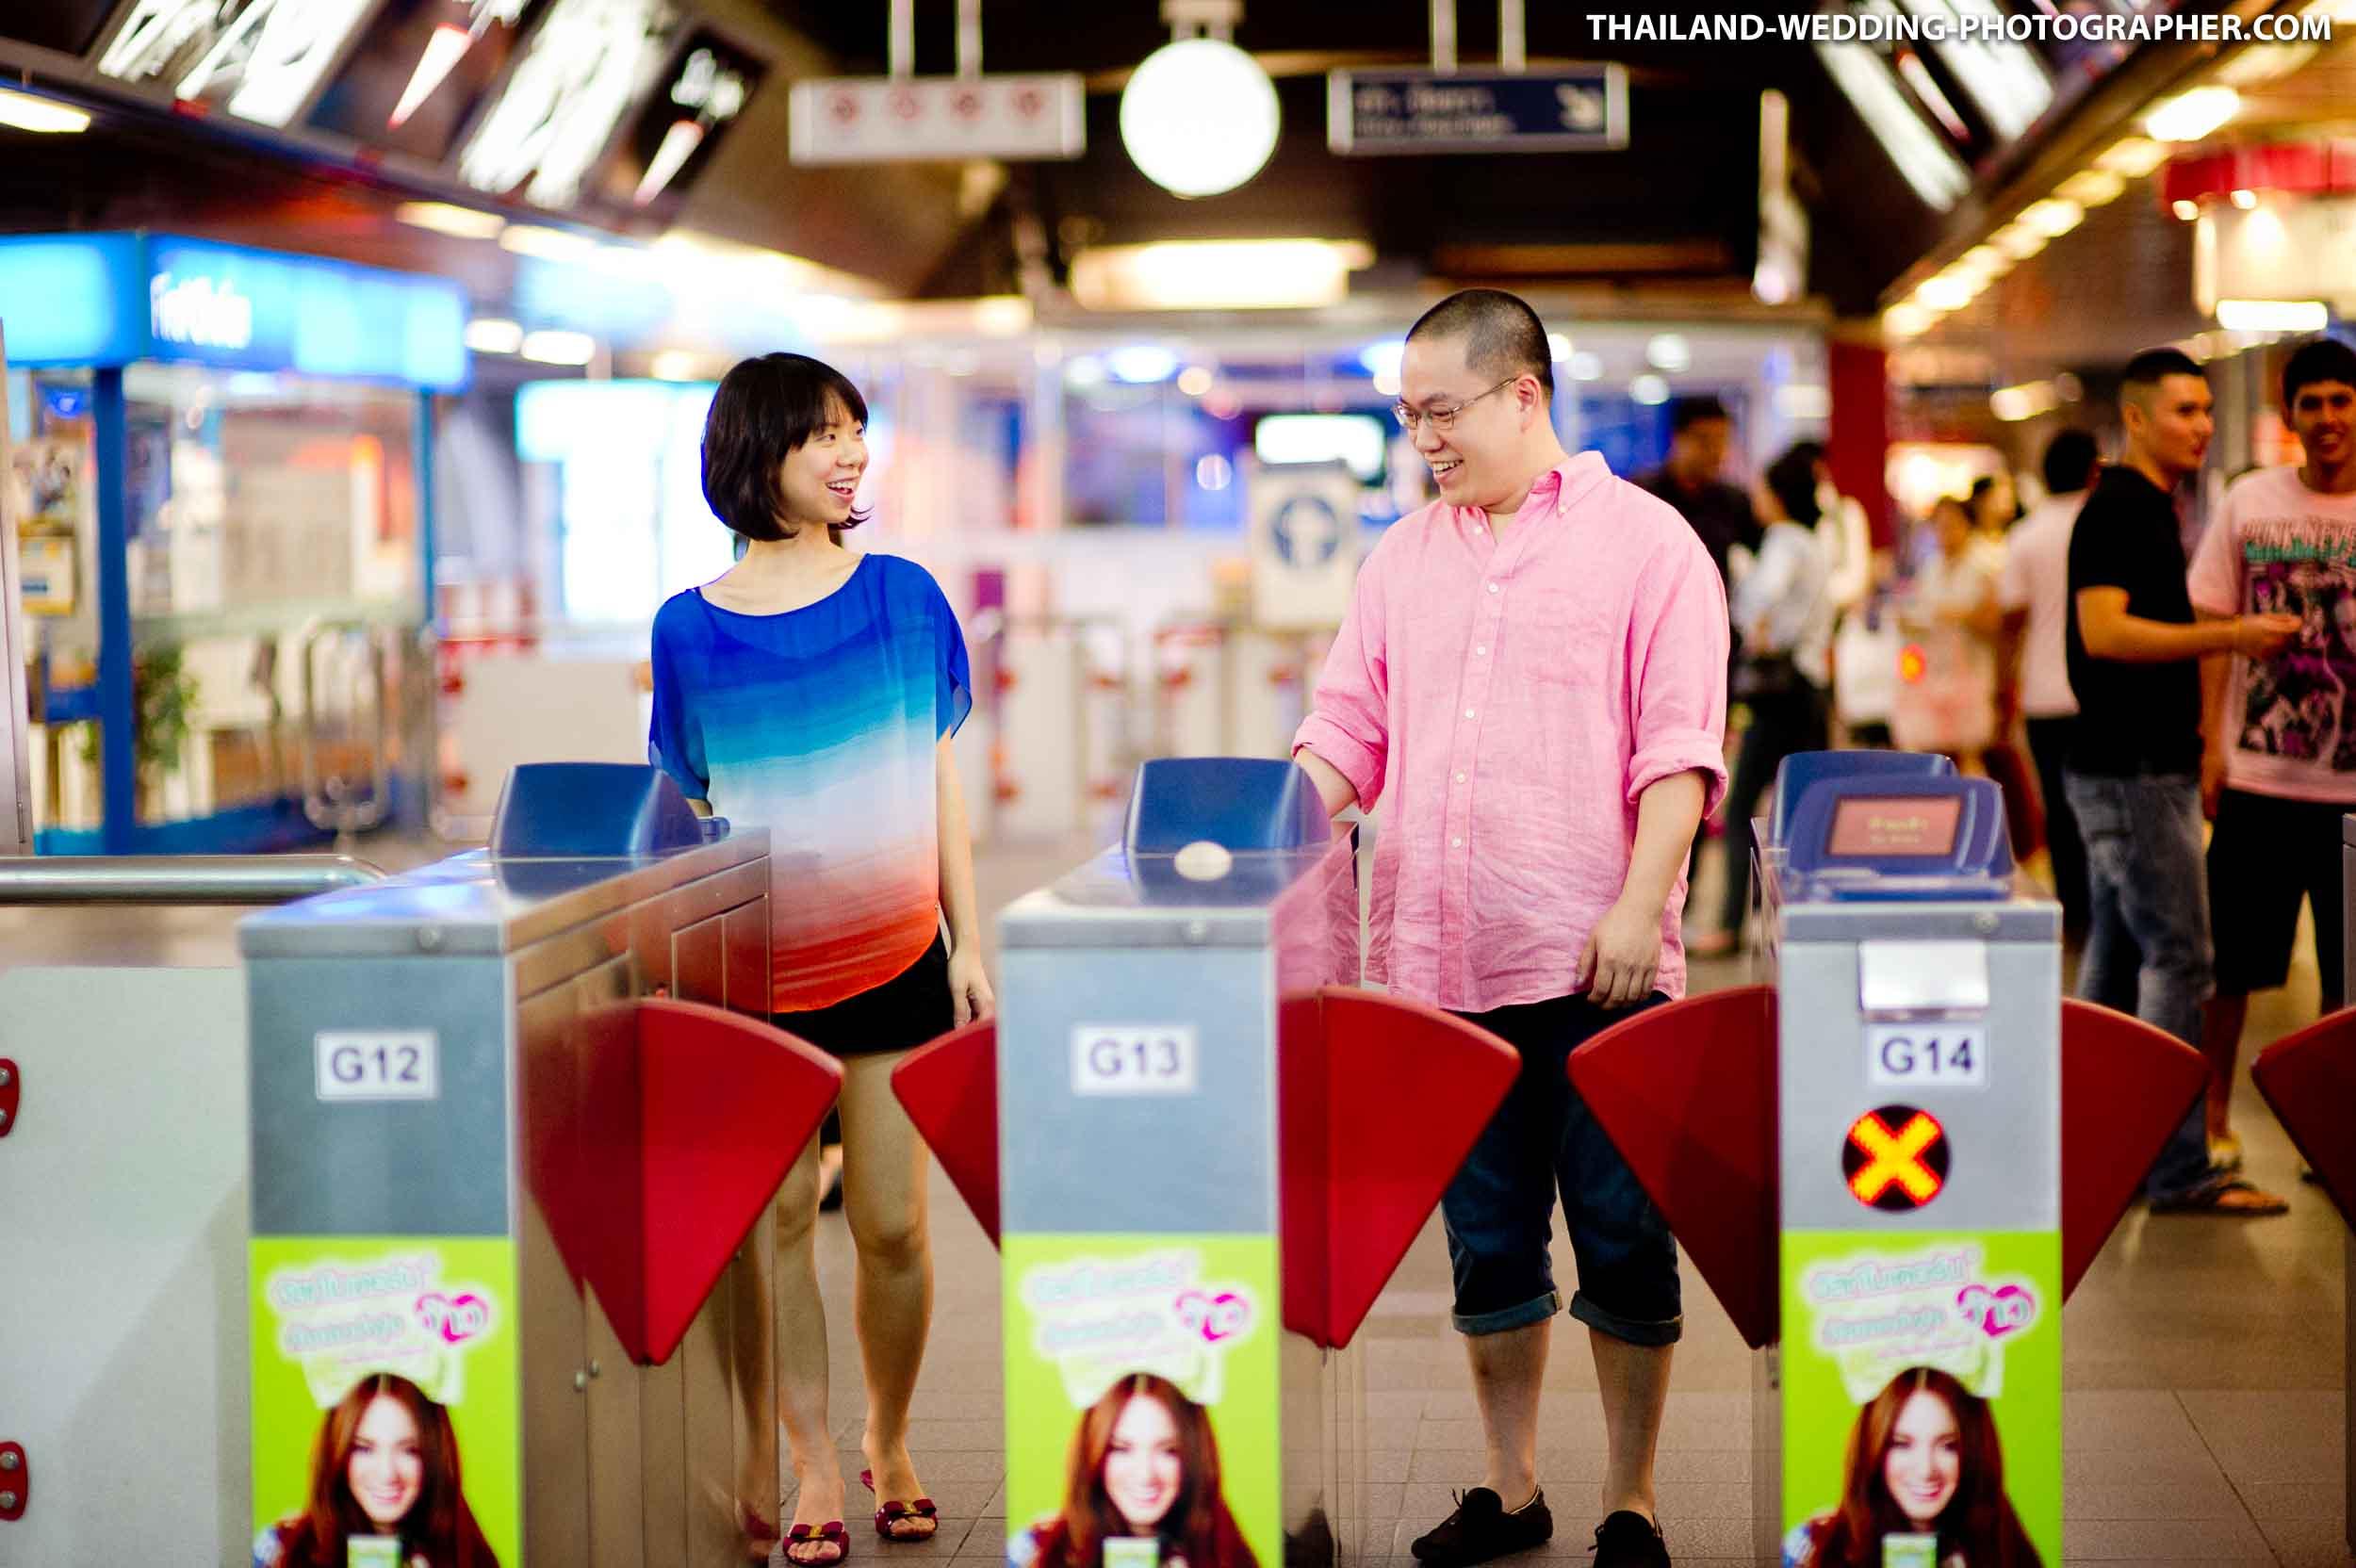 BTS Skytrain Bangkok Thailand Pre-Wedding